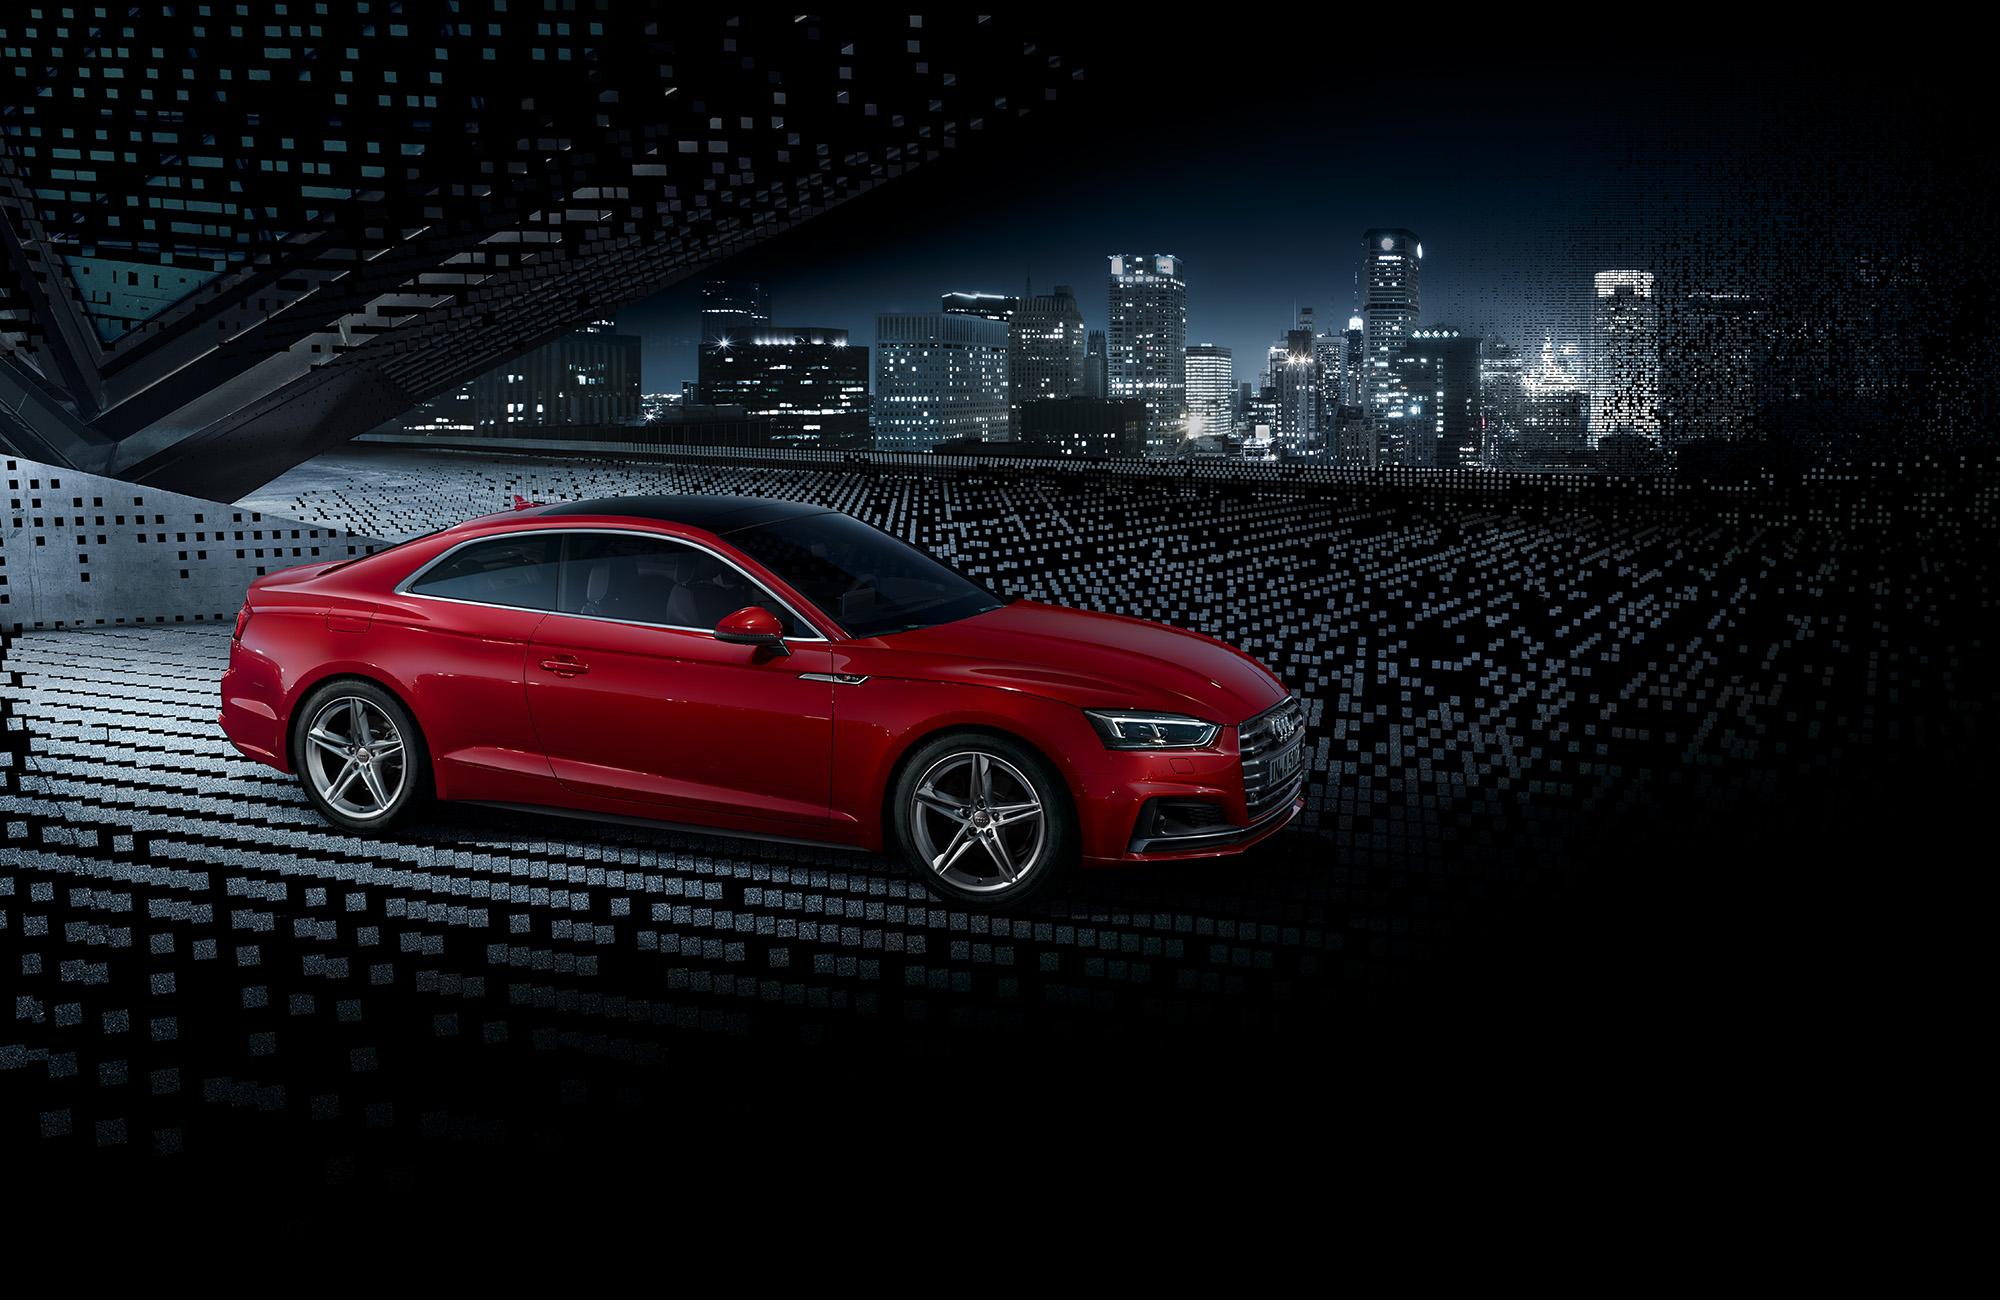 Client: Audi | Photographer: Markus Wendler | Agency: Kolle Rebbe